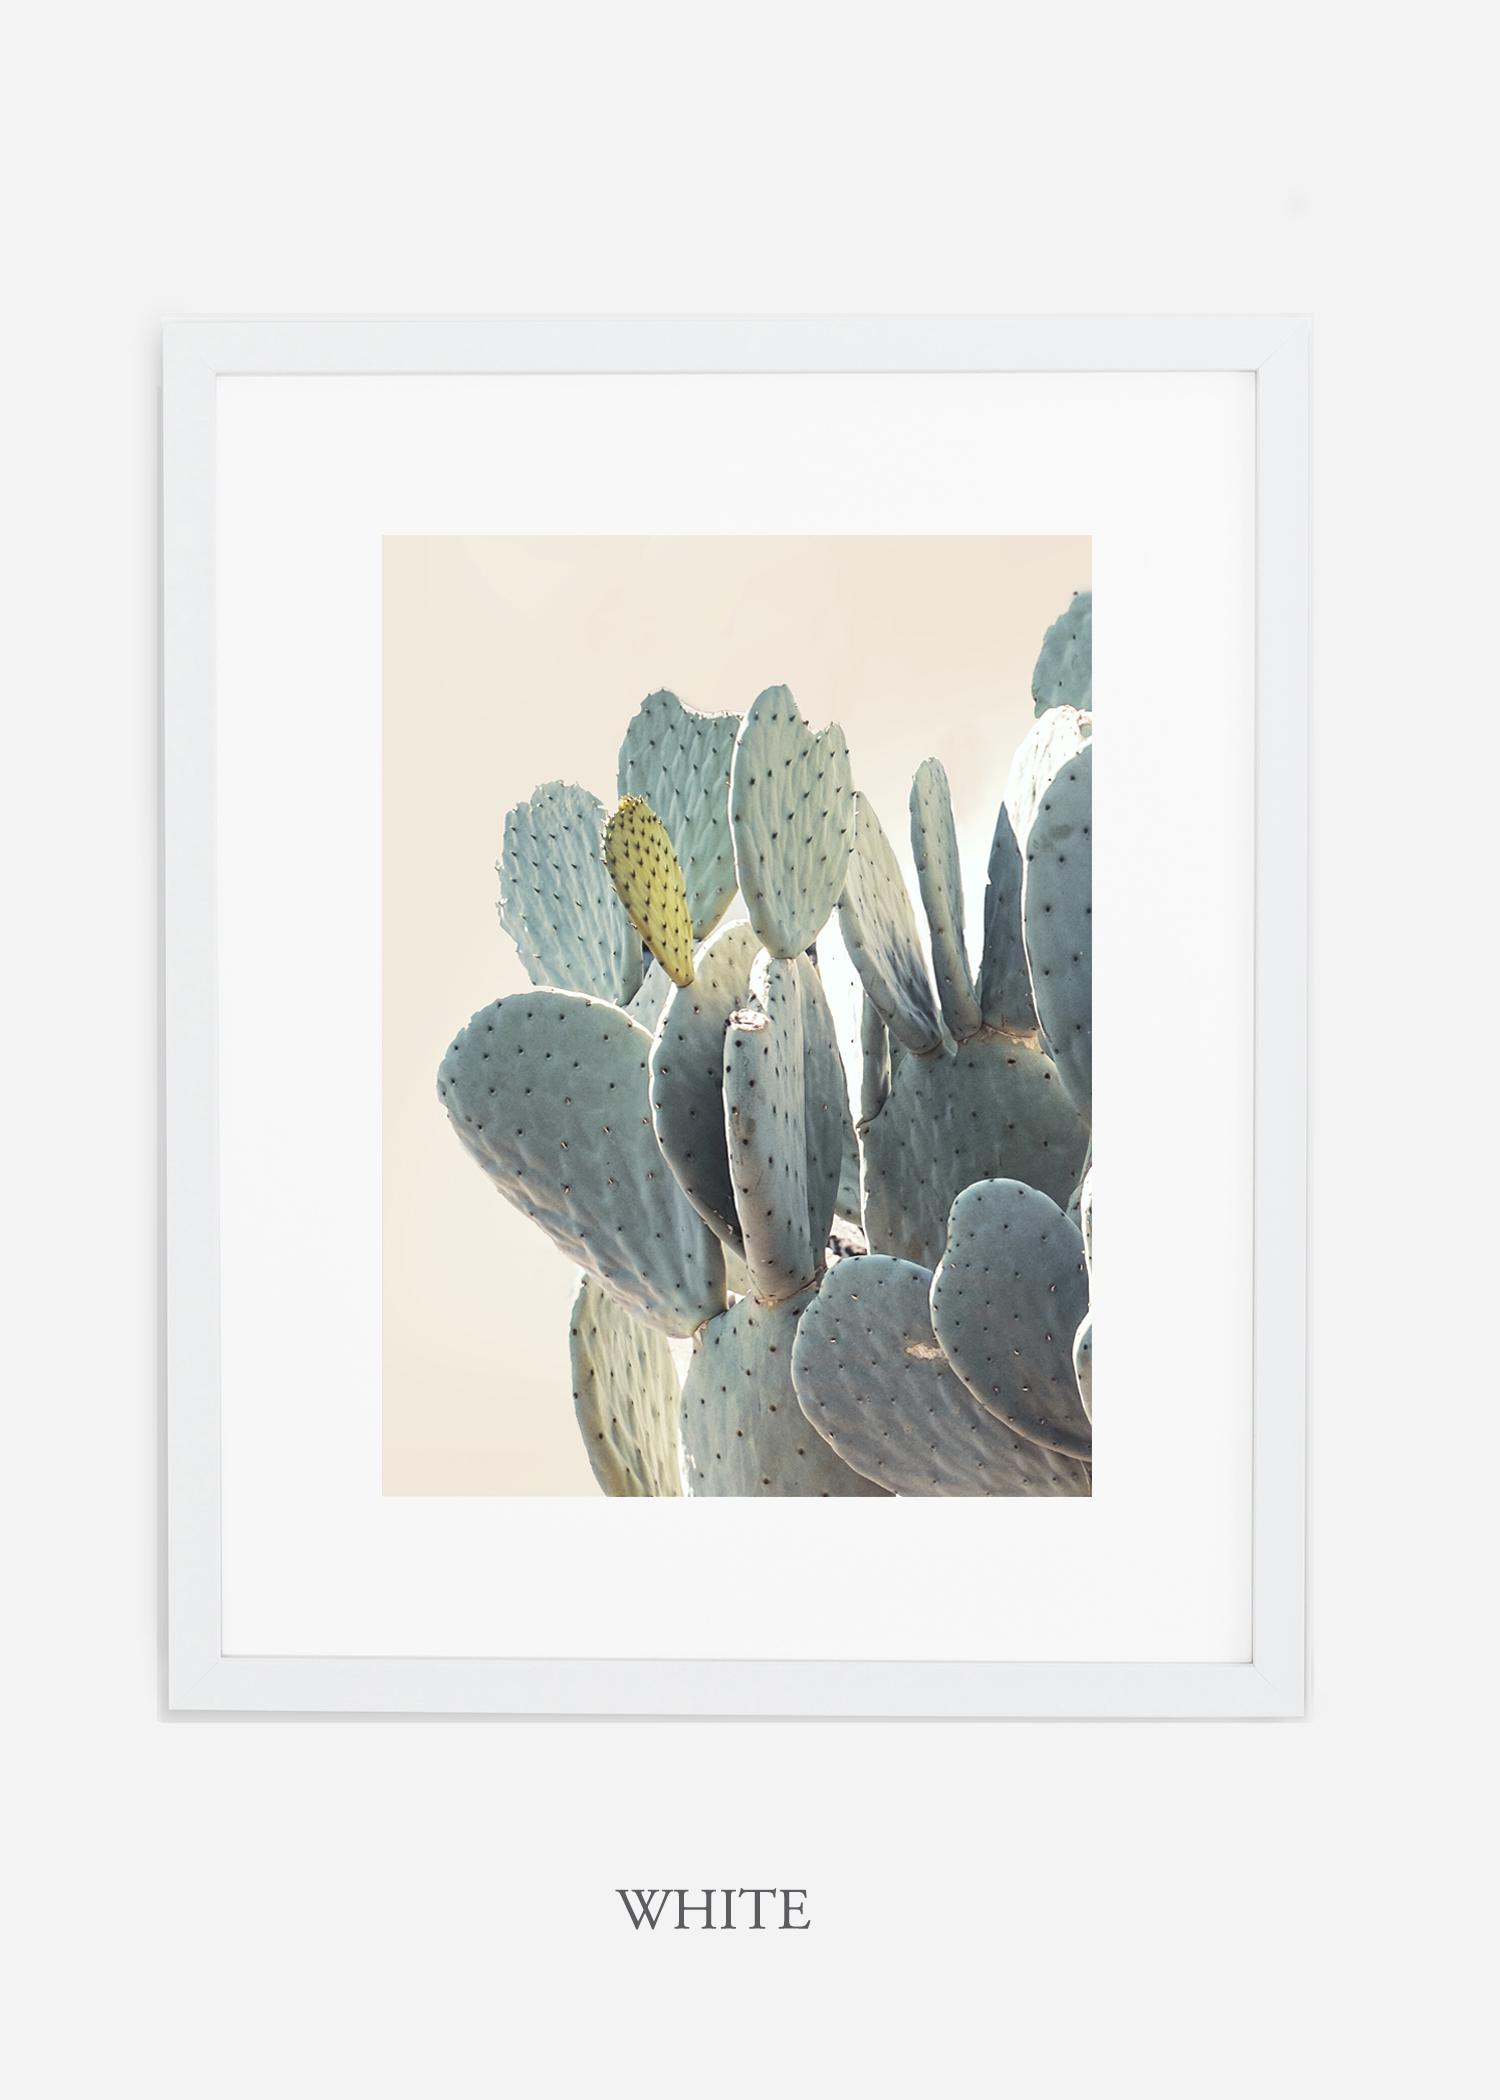 Desert_whiteframe_DesertDetails_Cactus__Art_Photography_interiordesign_bohemian_cactusart.jpg